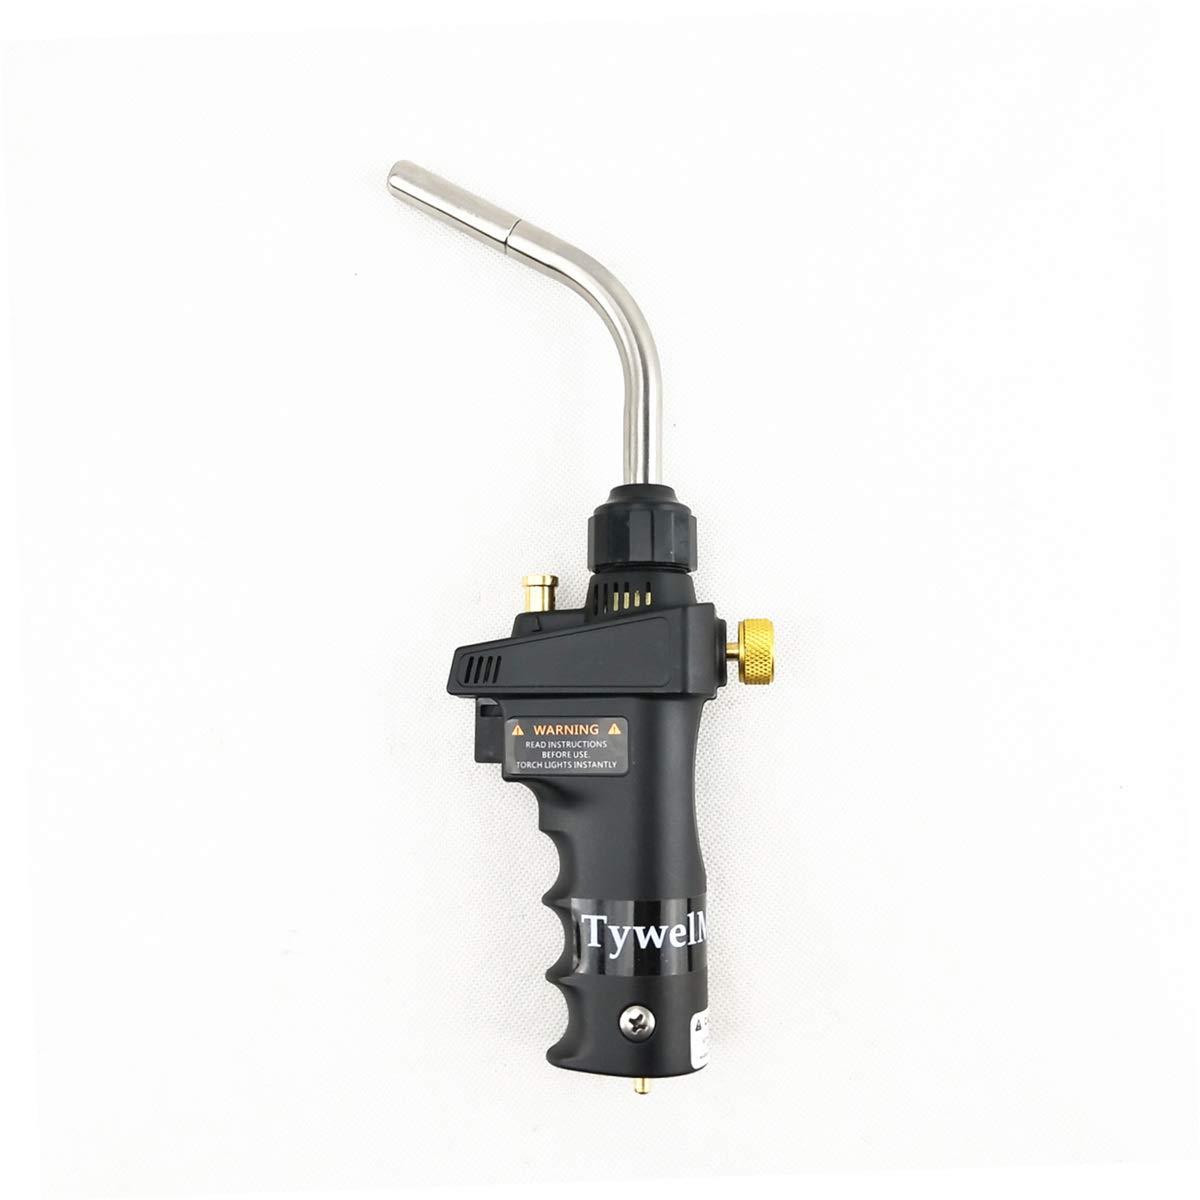 Mapp Gas Welding Torch, Ignition Flame Brazing Gun for Welding Jewelry BBQ HVAC Plumbing